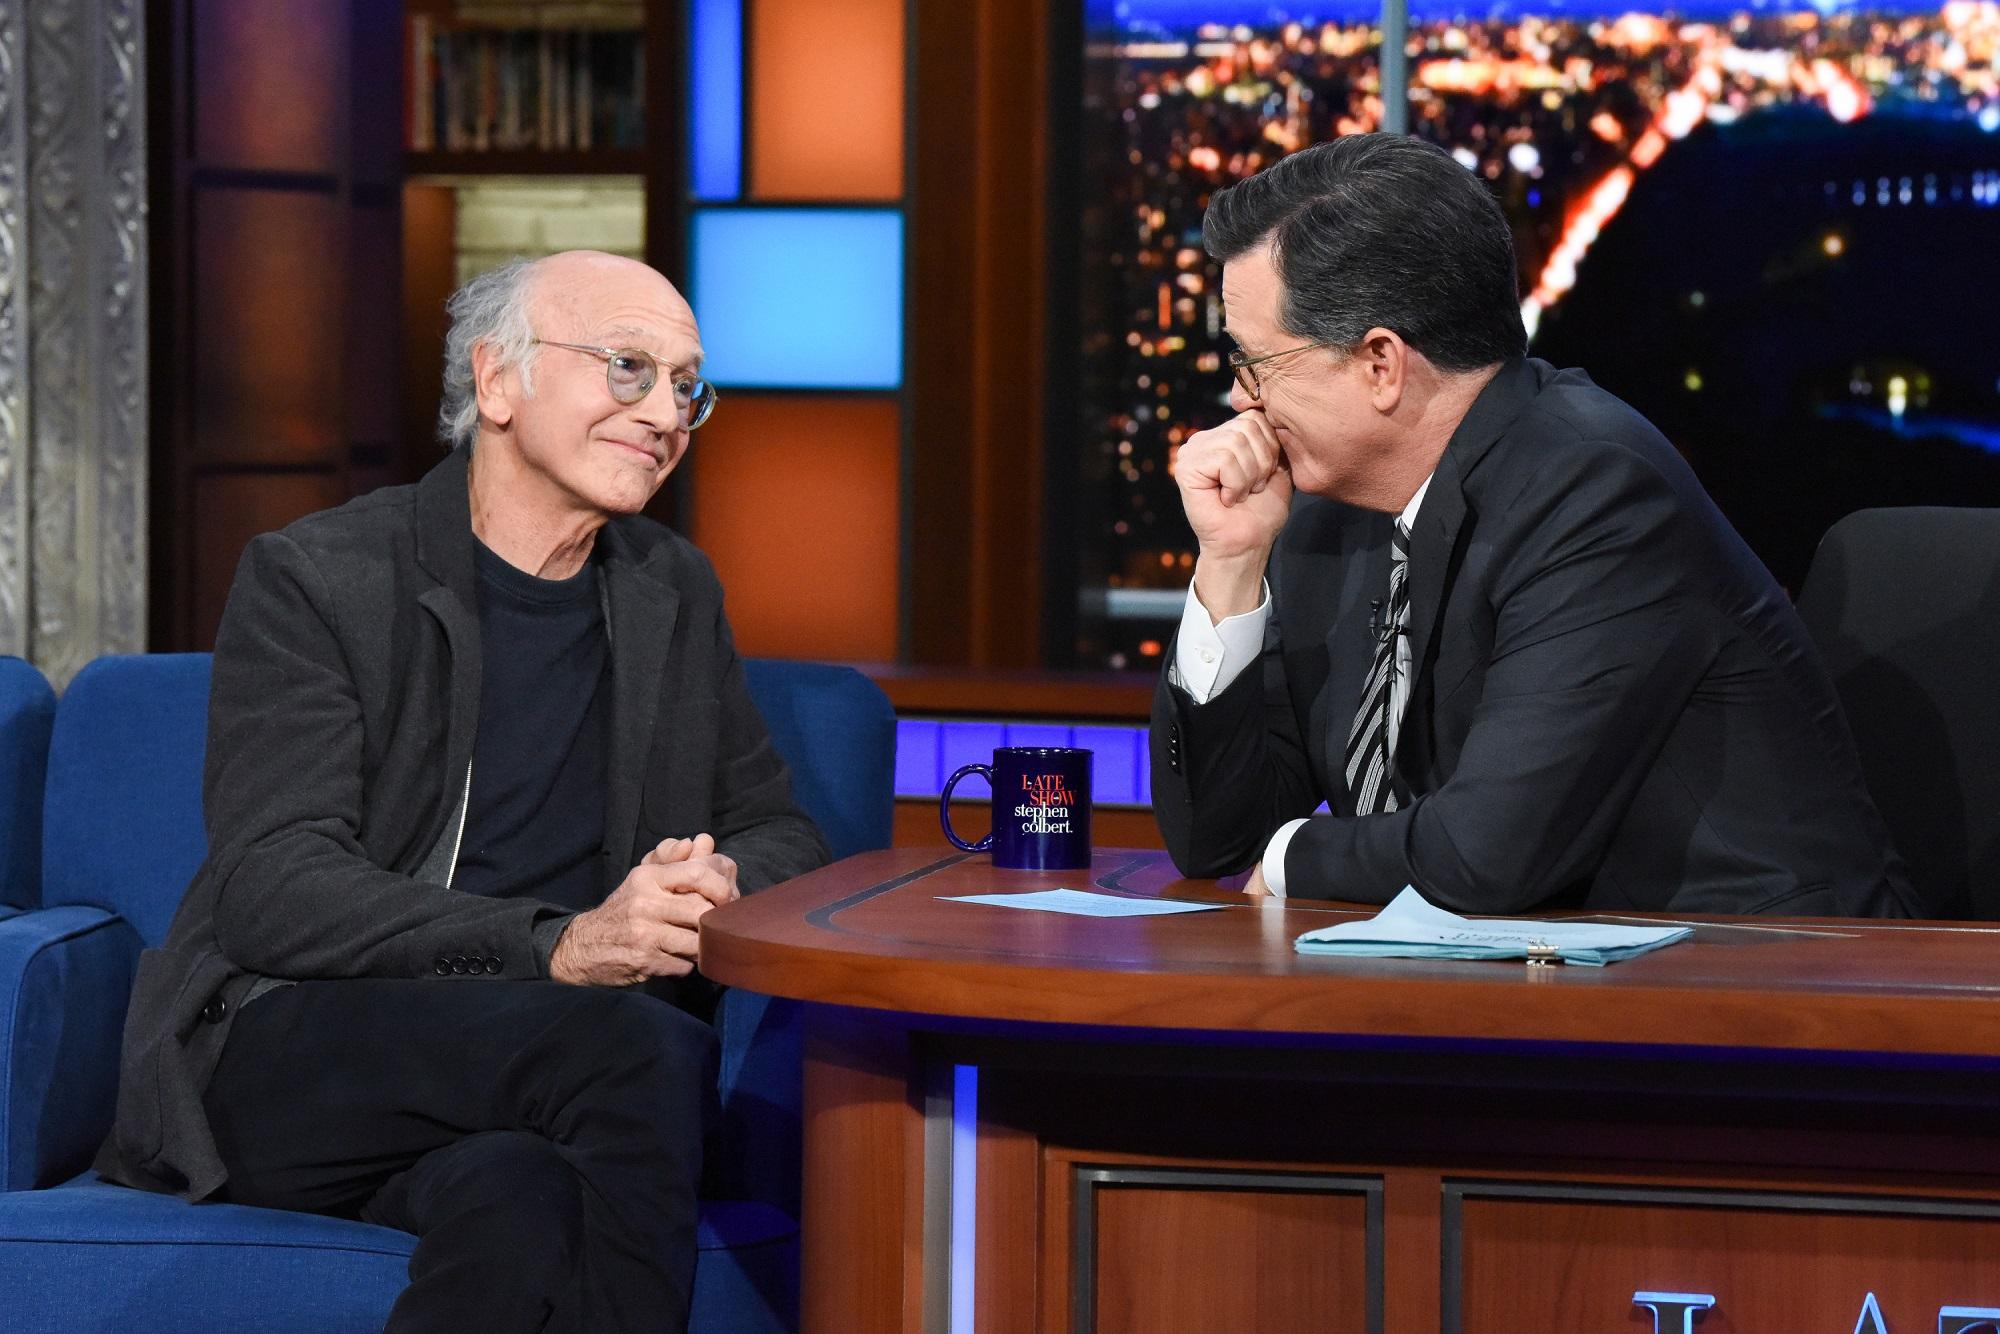 Stephen Colbert and Larry David